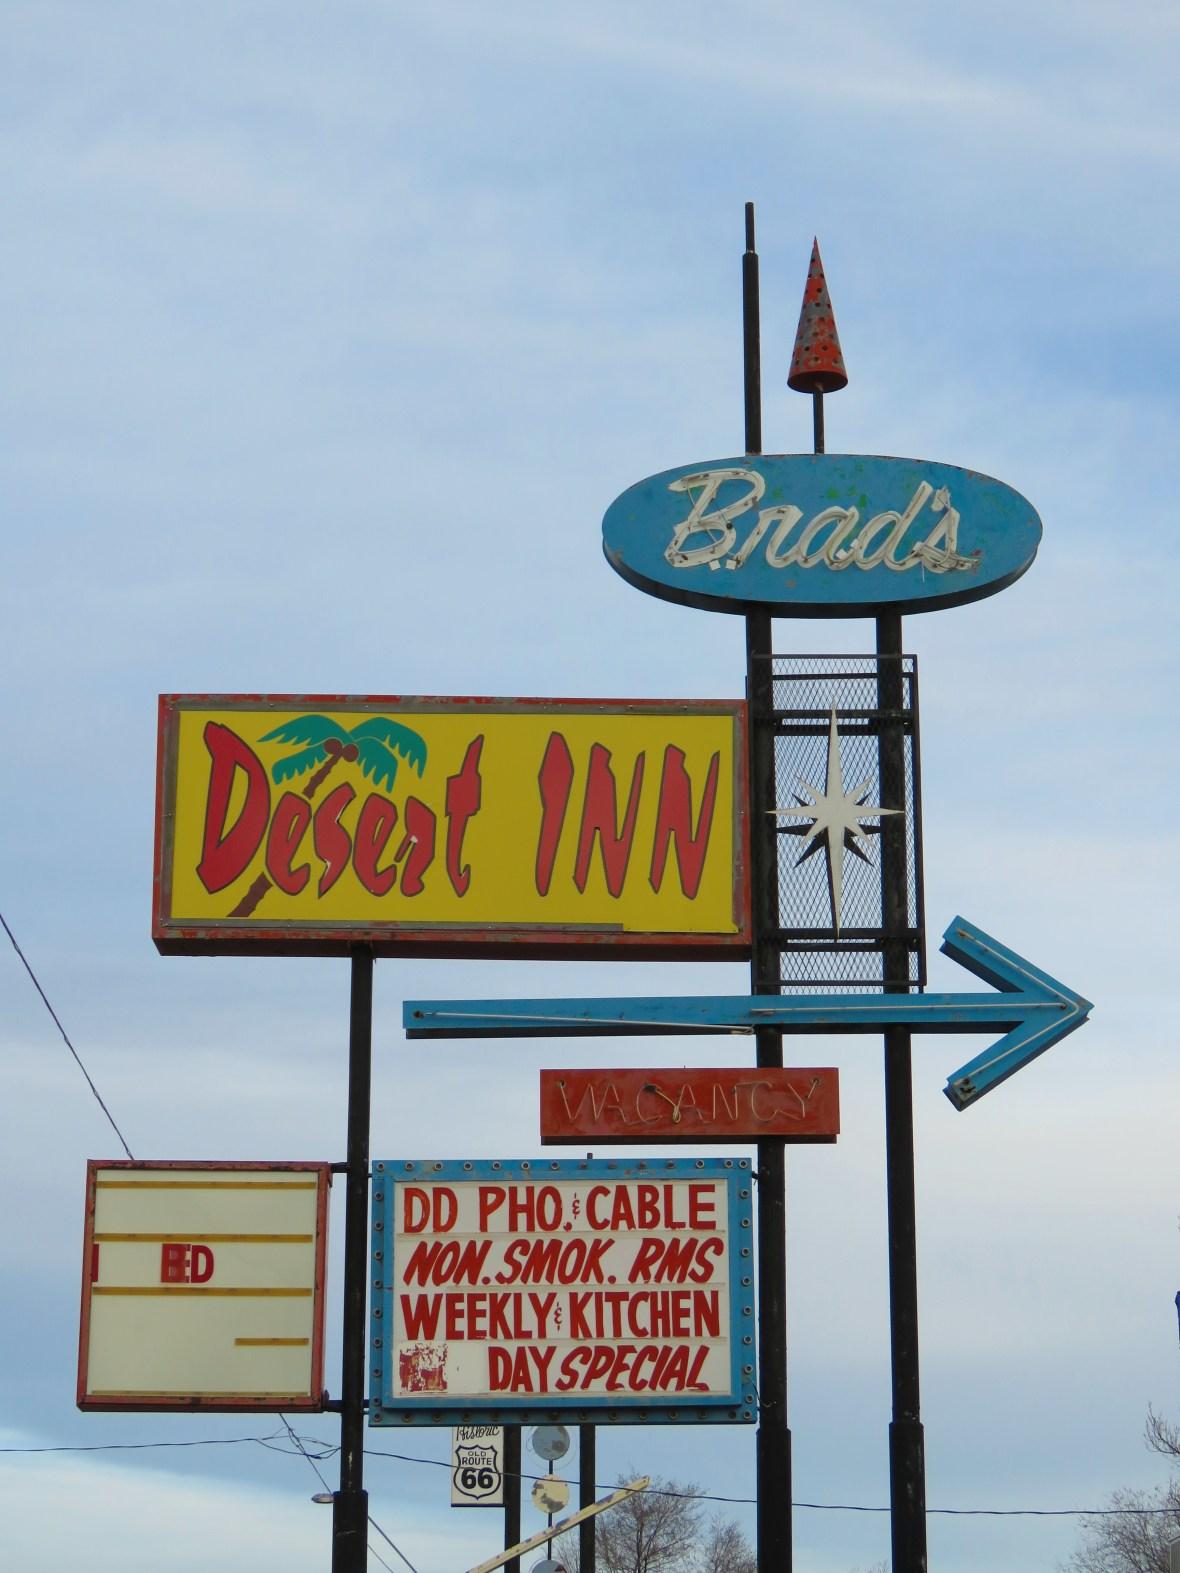 Brad's Desert Inn - 301 West Hopi Drive, Holbrook, Arizona U.S.A. - March 1, 2016